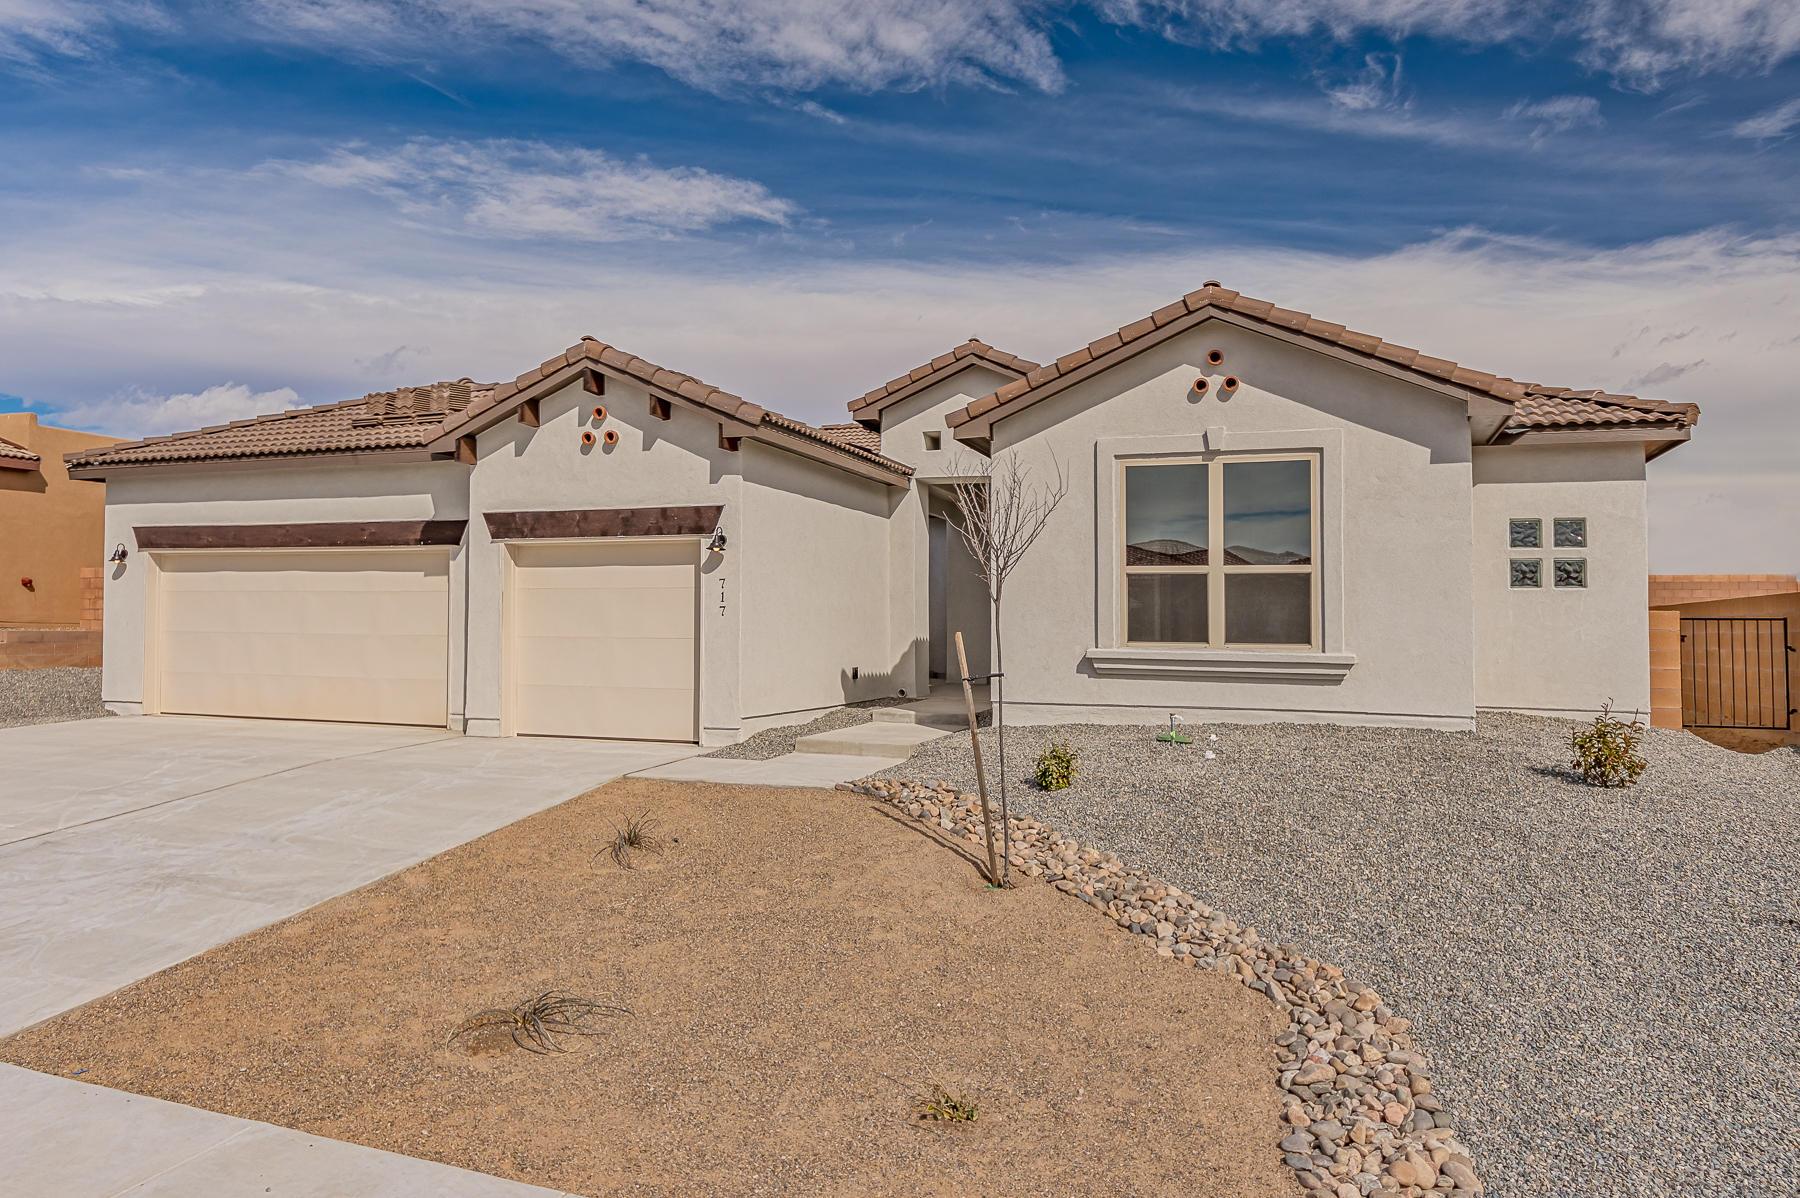 717 NE Tiwa Lane, Rio Rancho, New Mexico